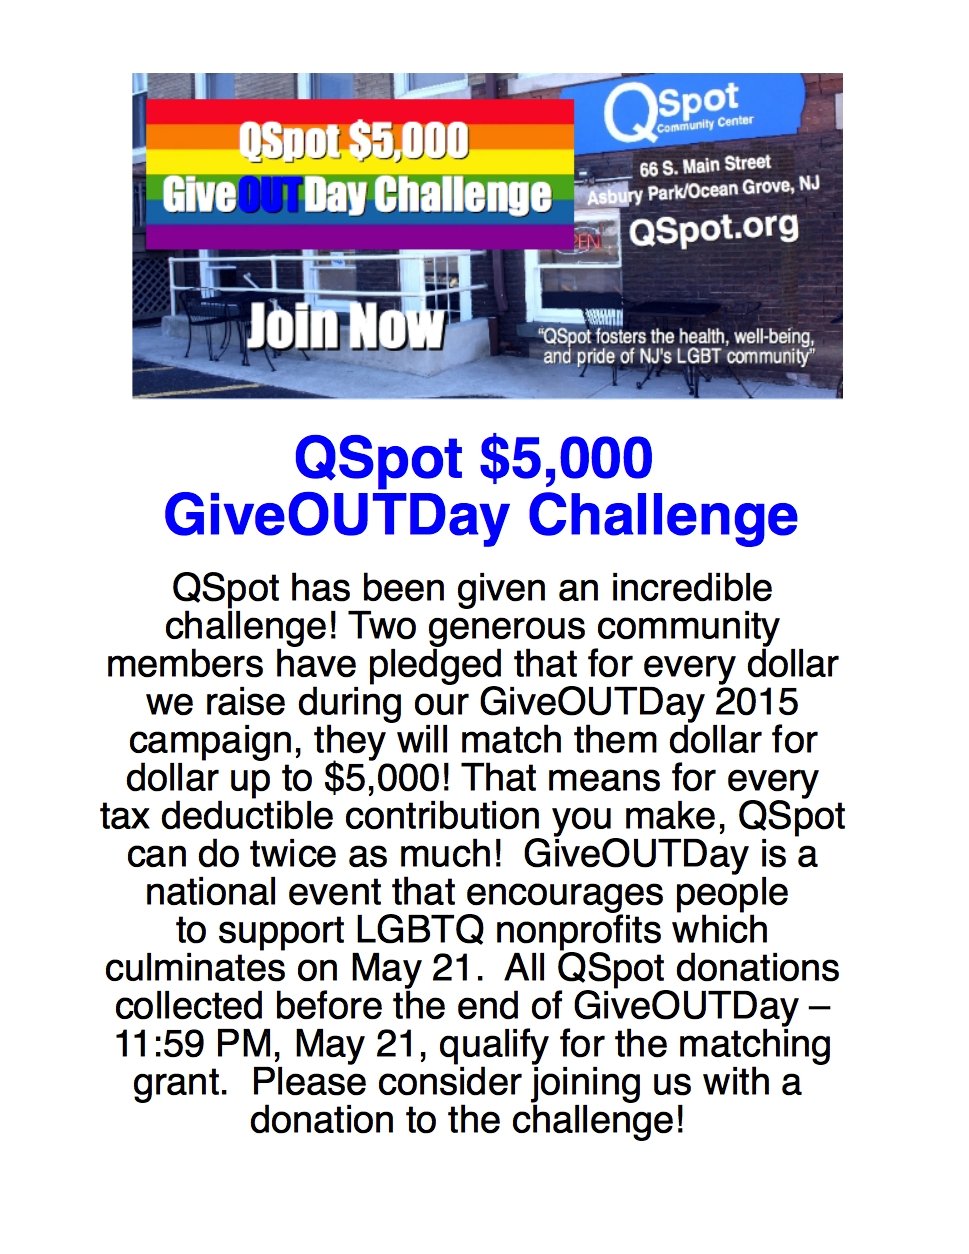 GDChallenge6   QSpot LGBT Community Center